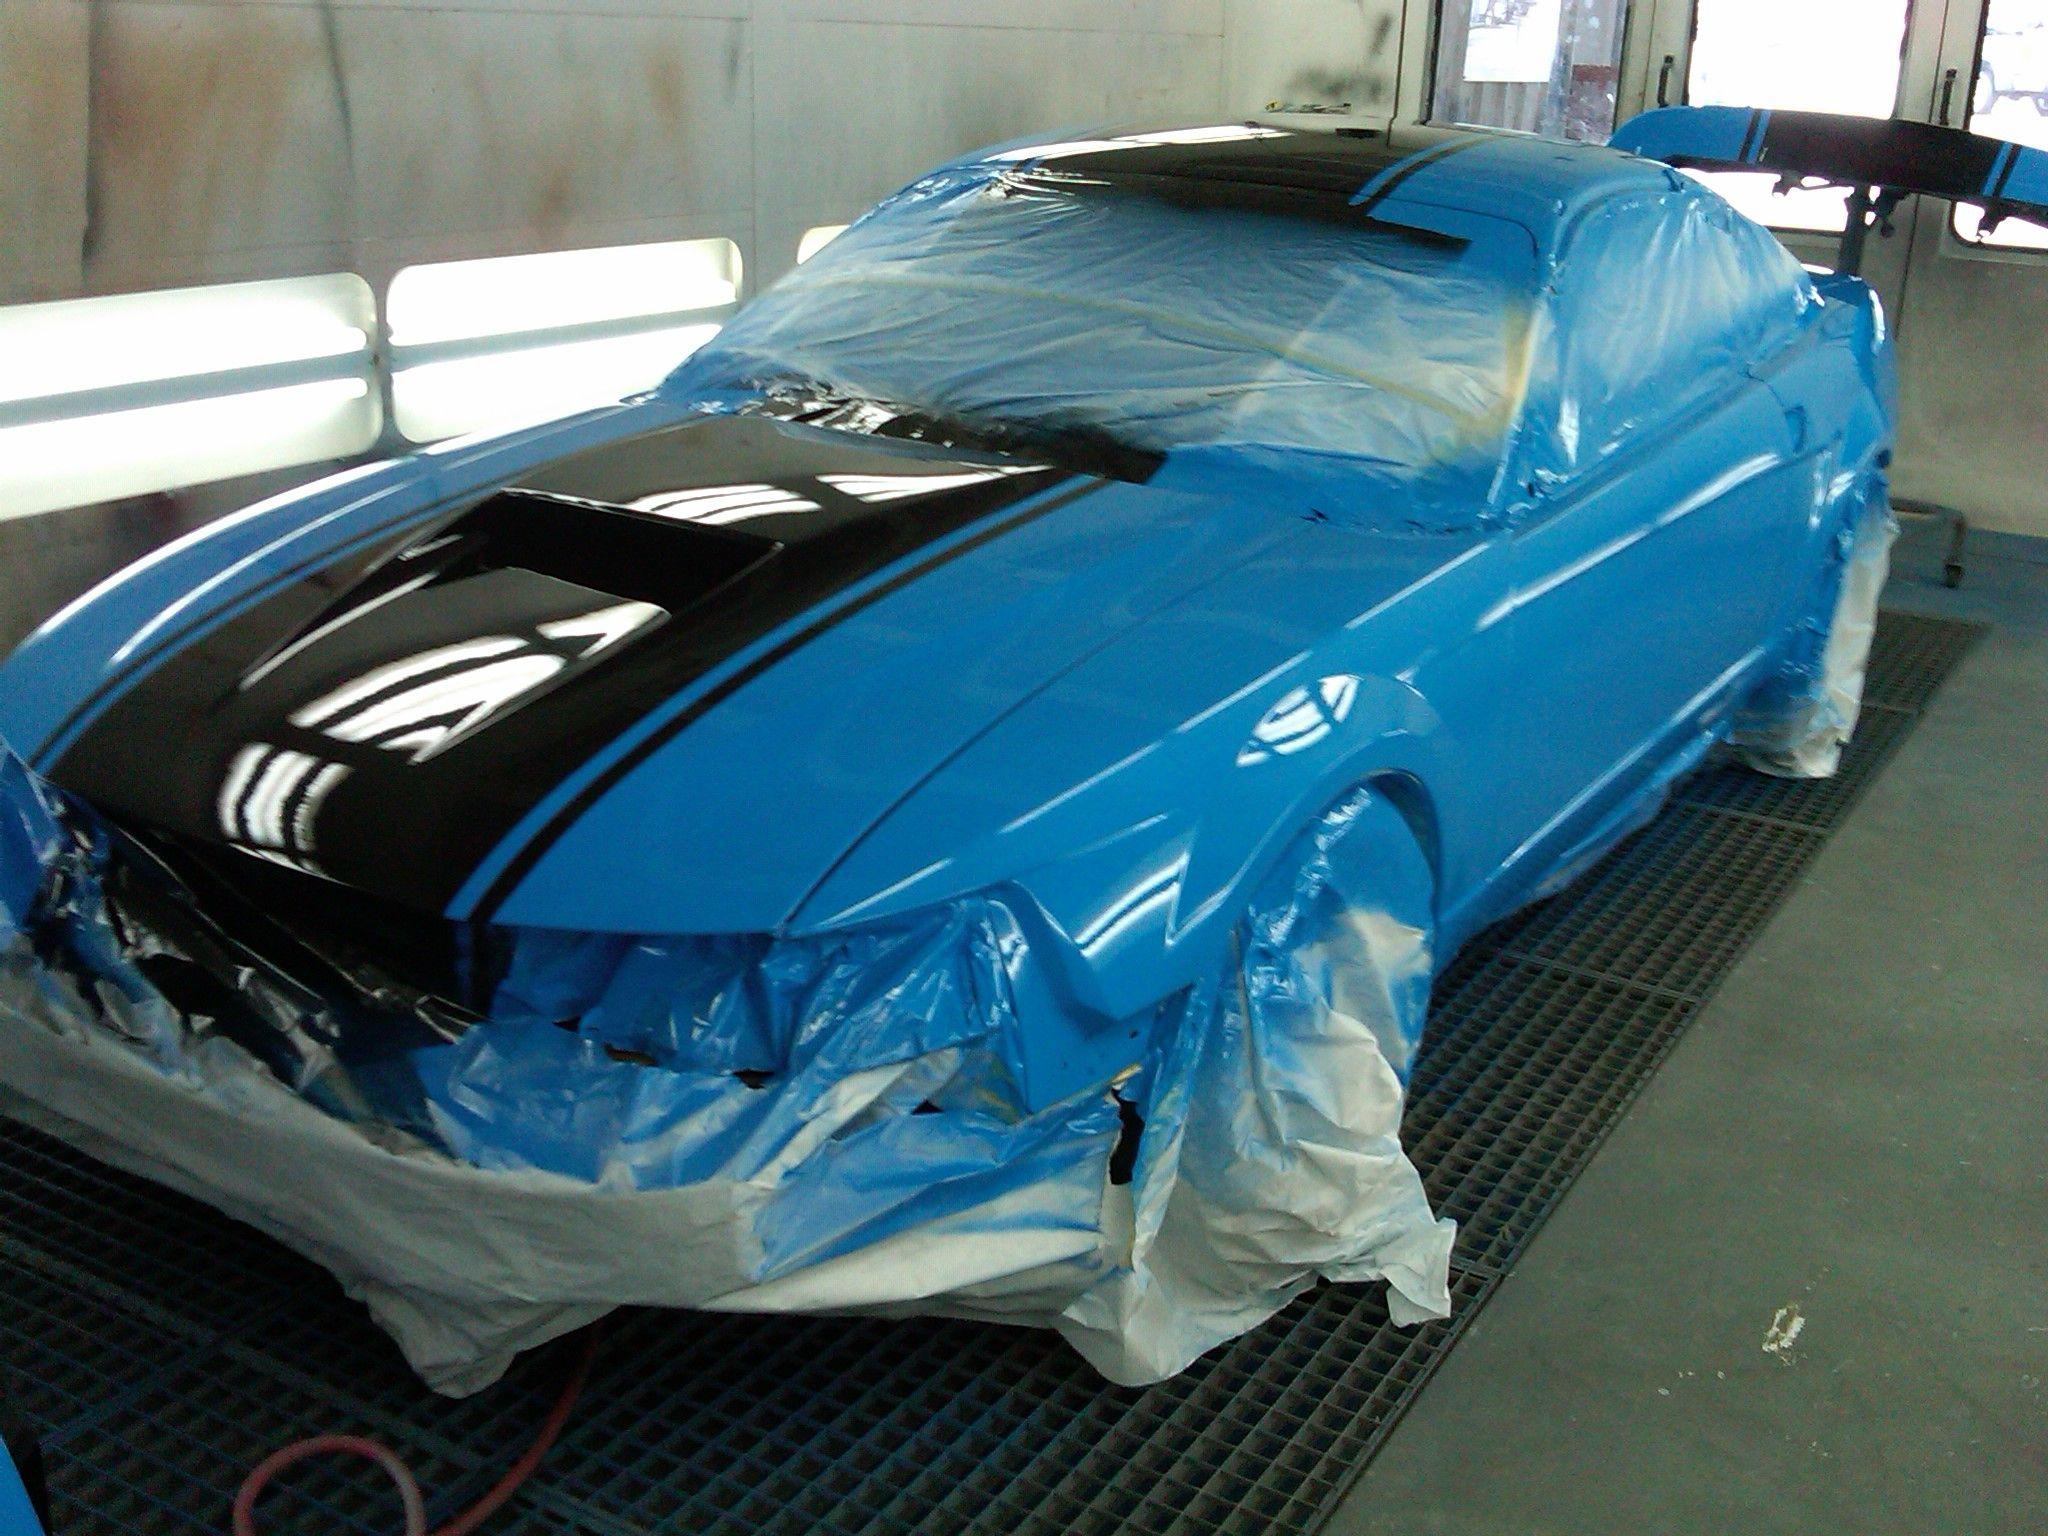 Grabber Blue New Edge Freshly Painted Blue Mustang Mustang Cars Cars Near Me